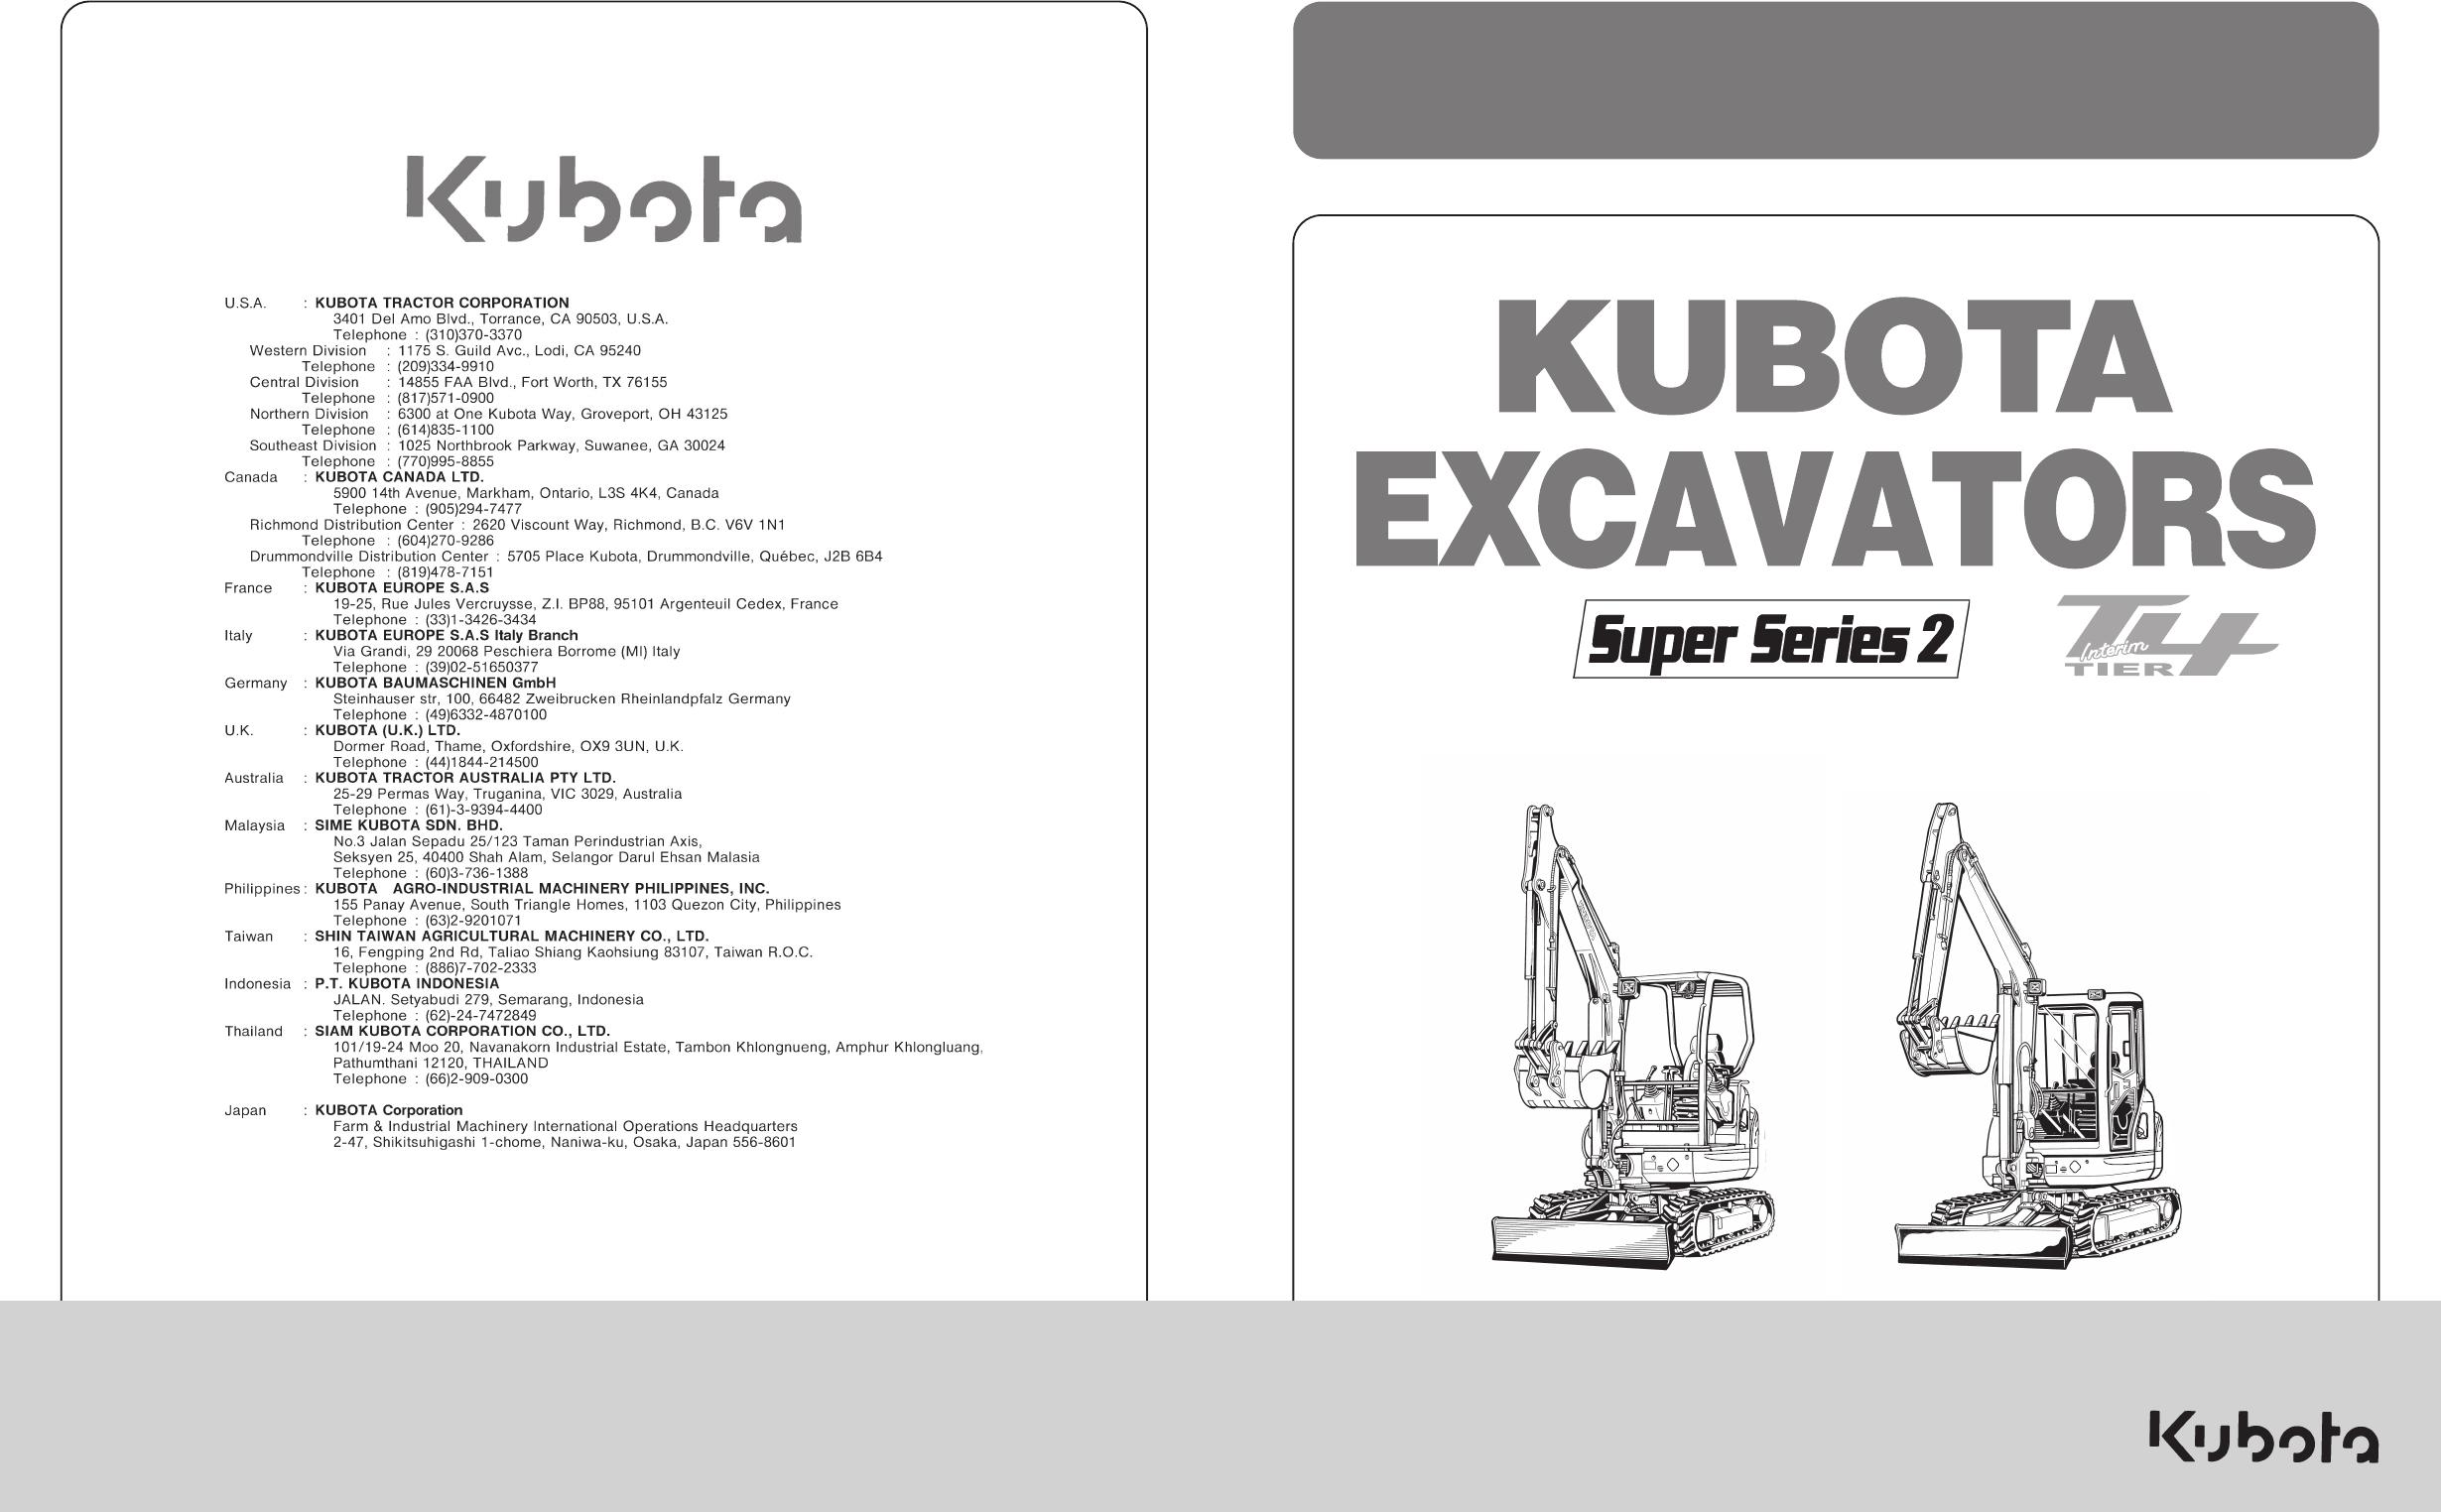 handleiding kubota kx91 3 pagina 1 van 98 english rh gebruikershandleiding com kubota kx91 3 owners manual kubota kx91-3 service manual